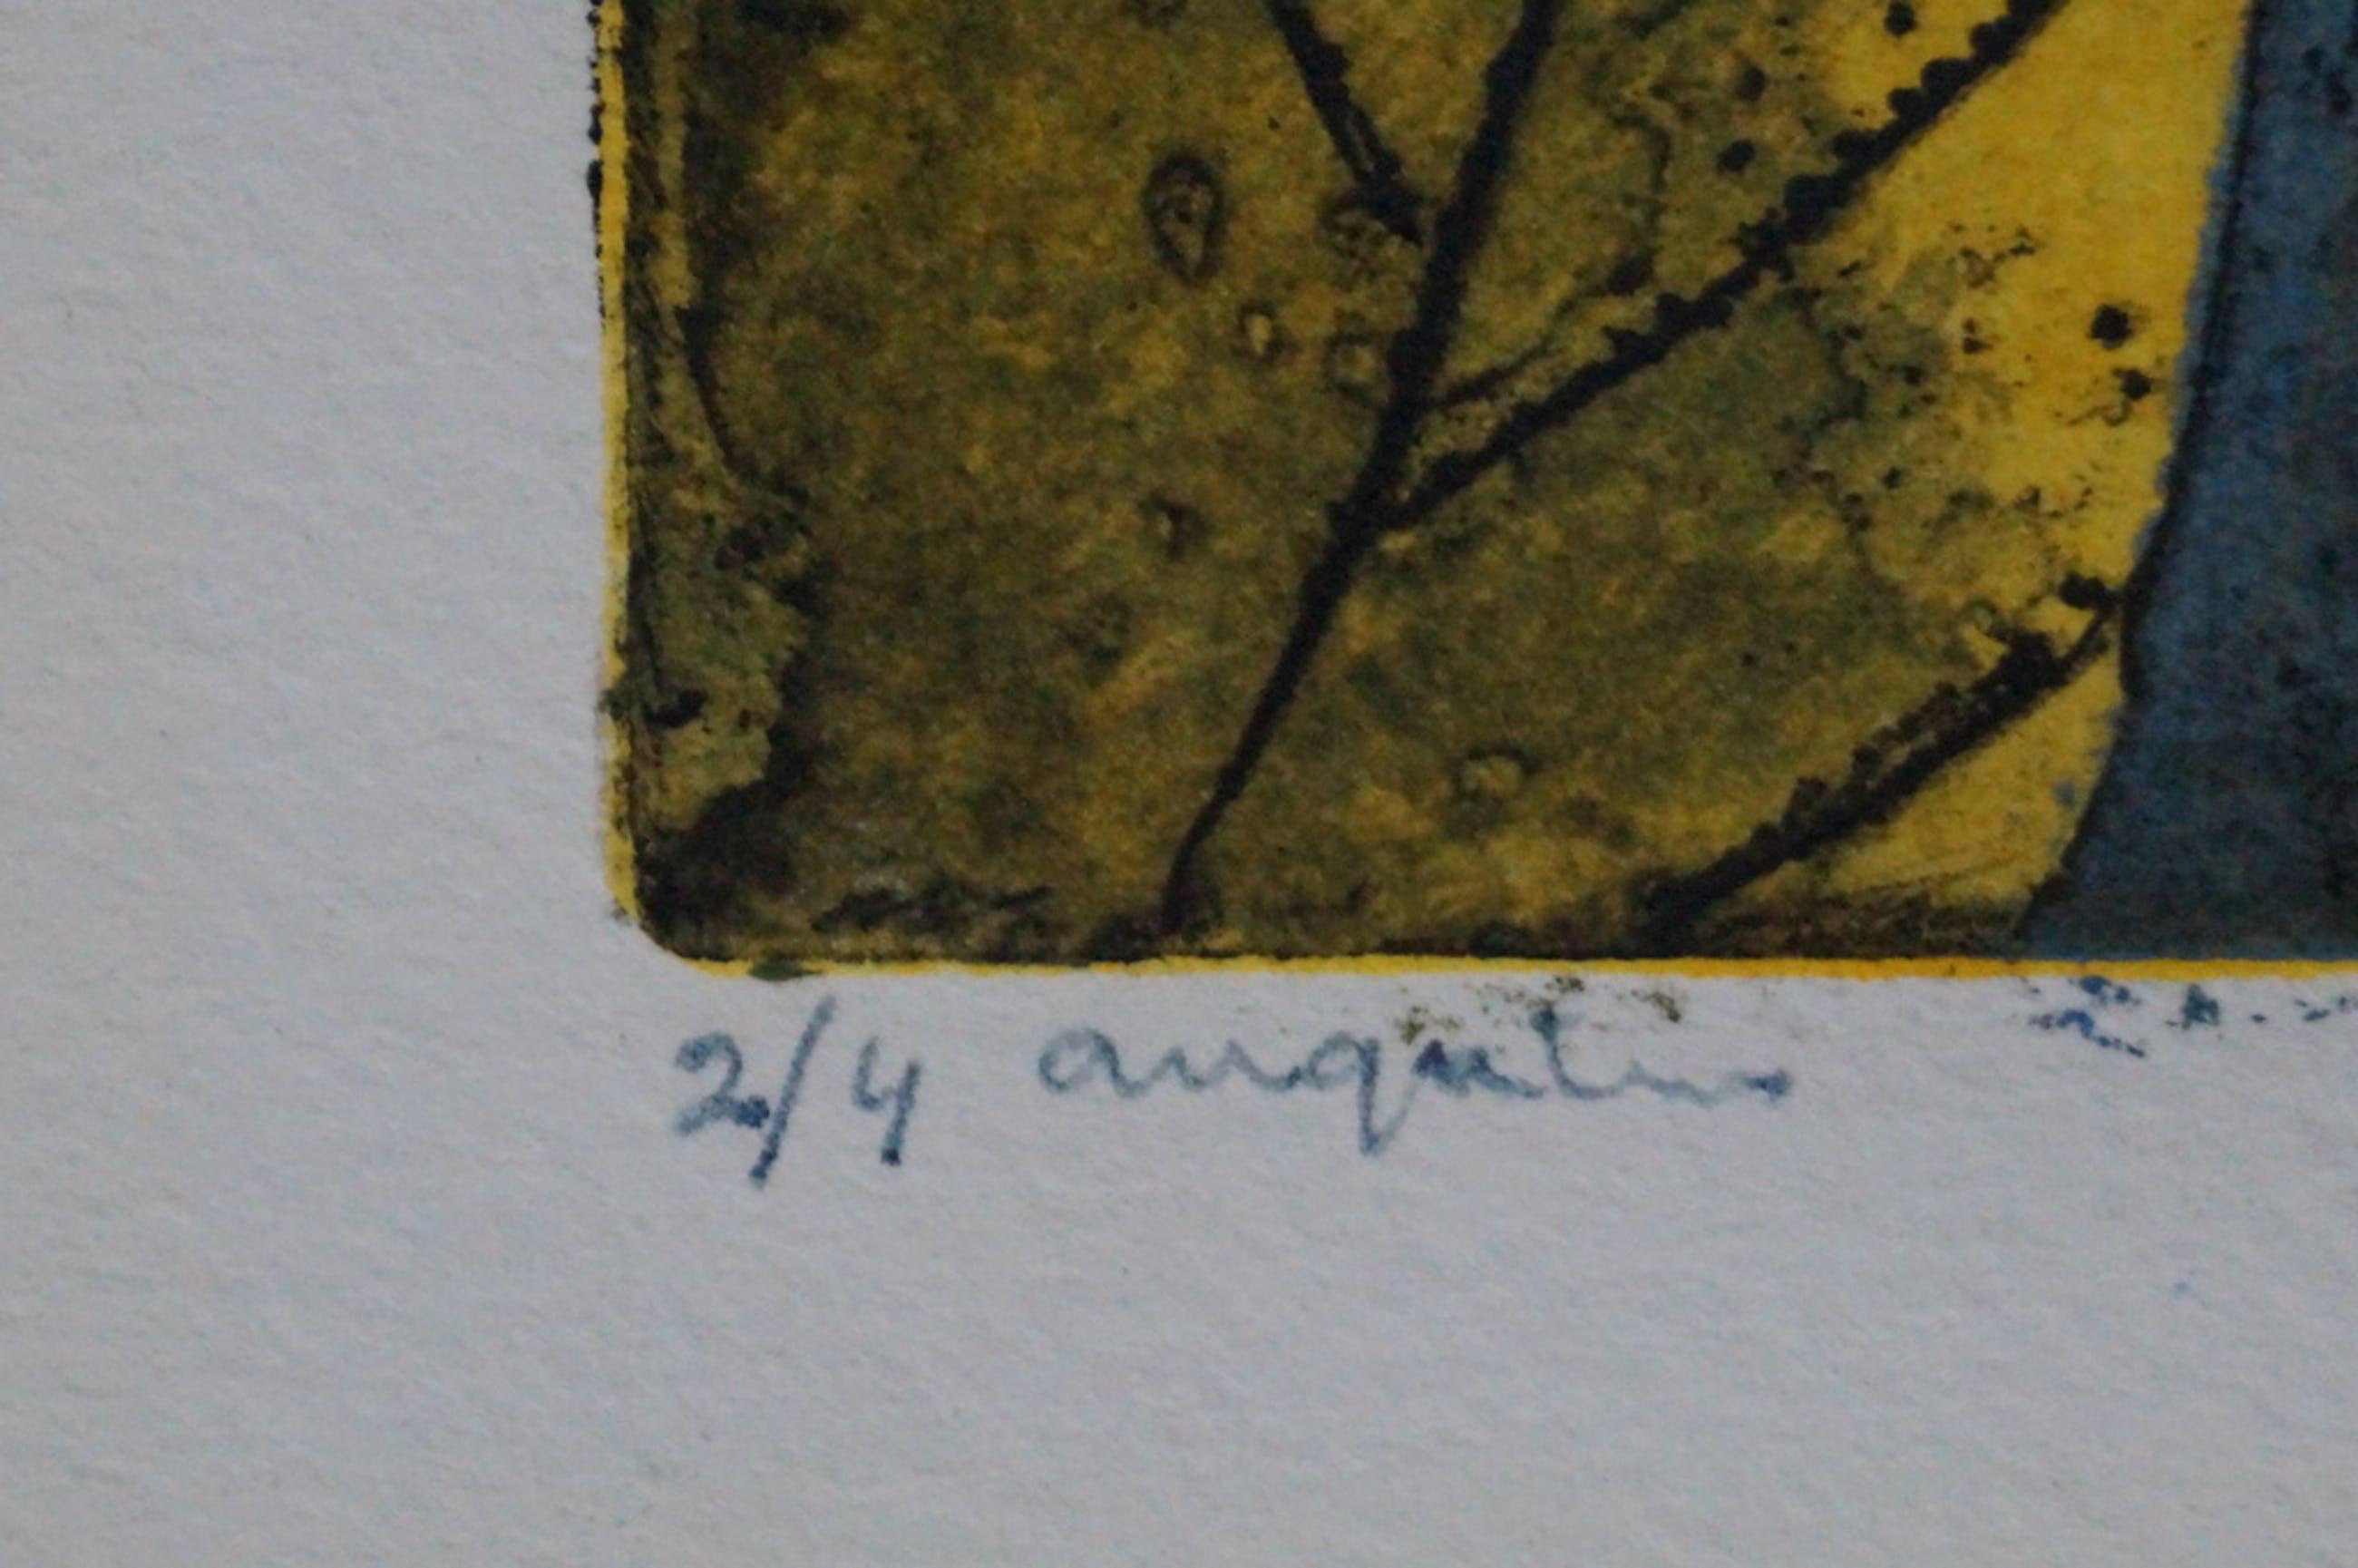 Onbekende kunstenaar - gesigneerde ets - 4 ex. kopen? Bied vanaf 10!